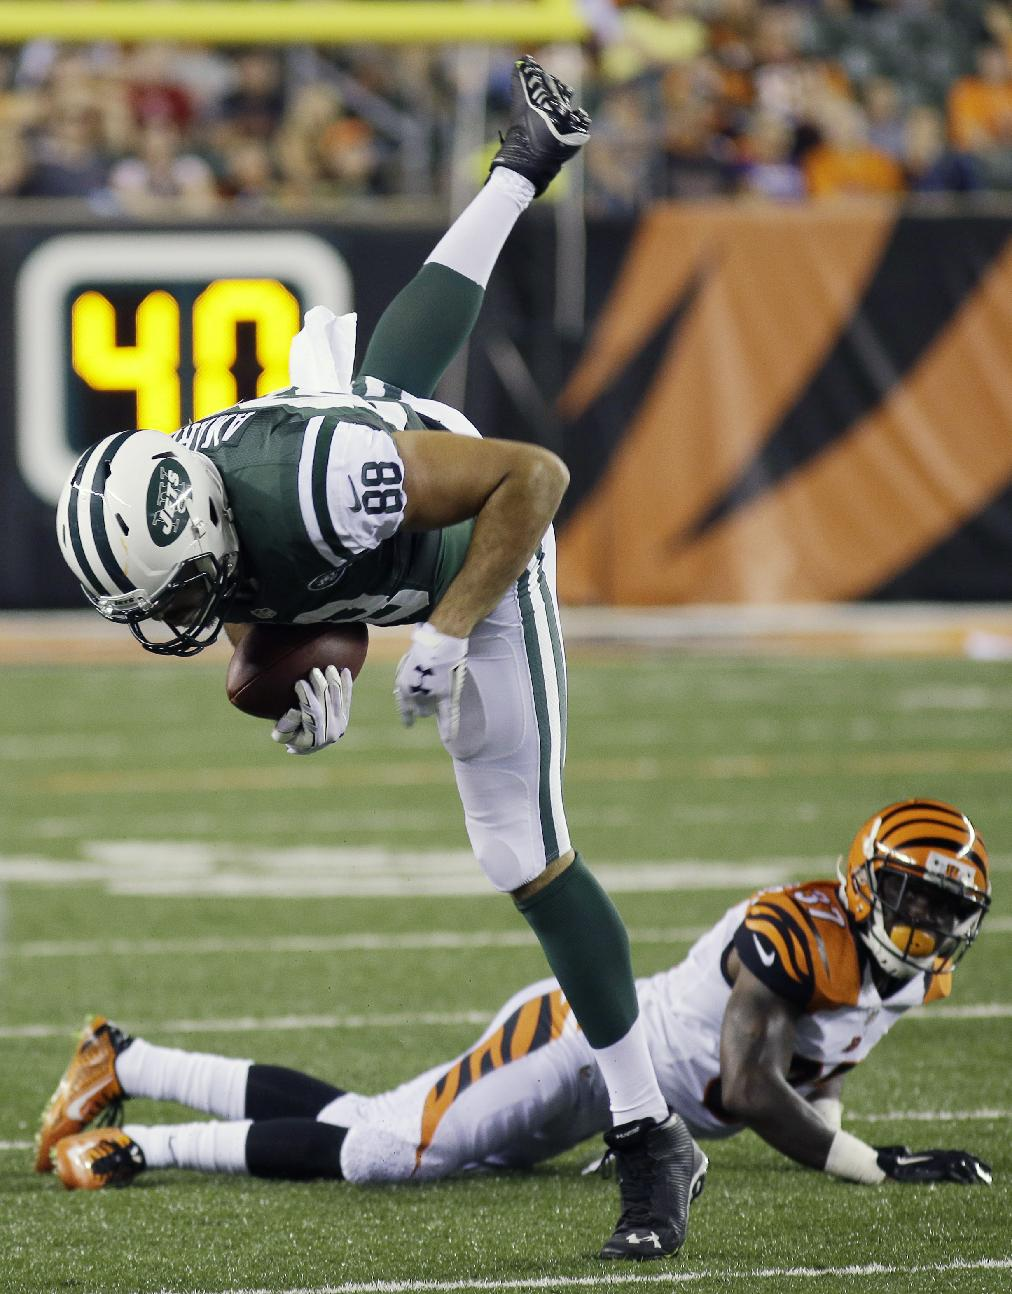 New York Jets tight end Jace Amaro (88) is tripped up by Cincinnati Bengals cornerback Chris Lewis-Harris in the second half of an NFL preseason football game, Saturday, Aug. 16, 2014, in Cincinnati